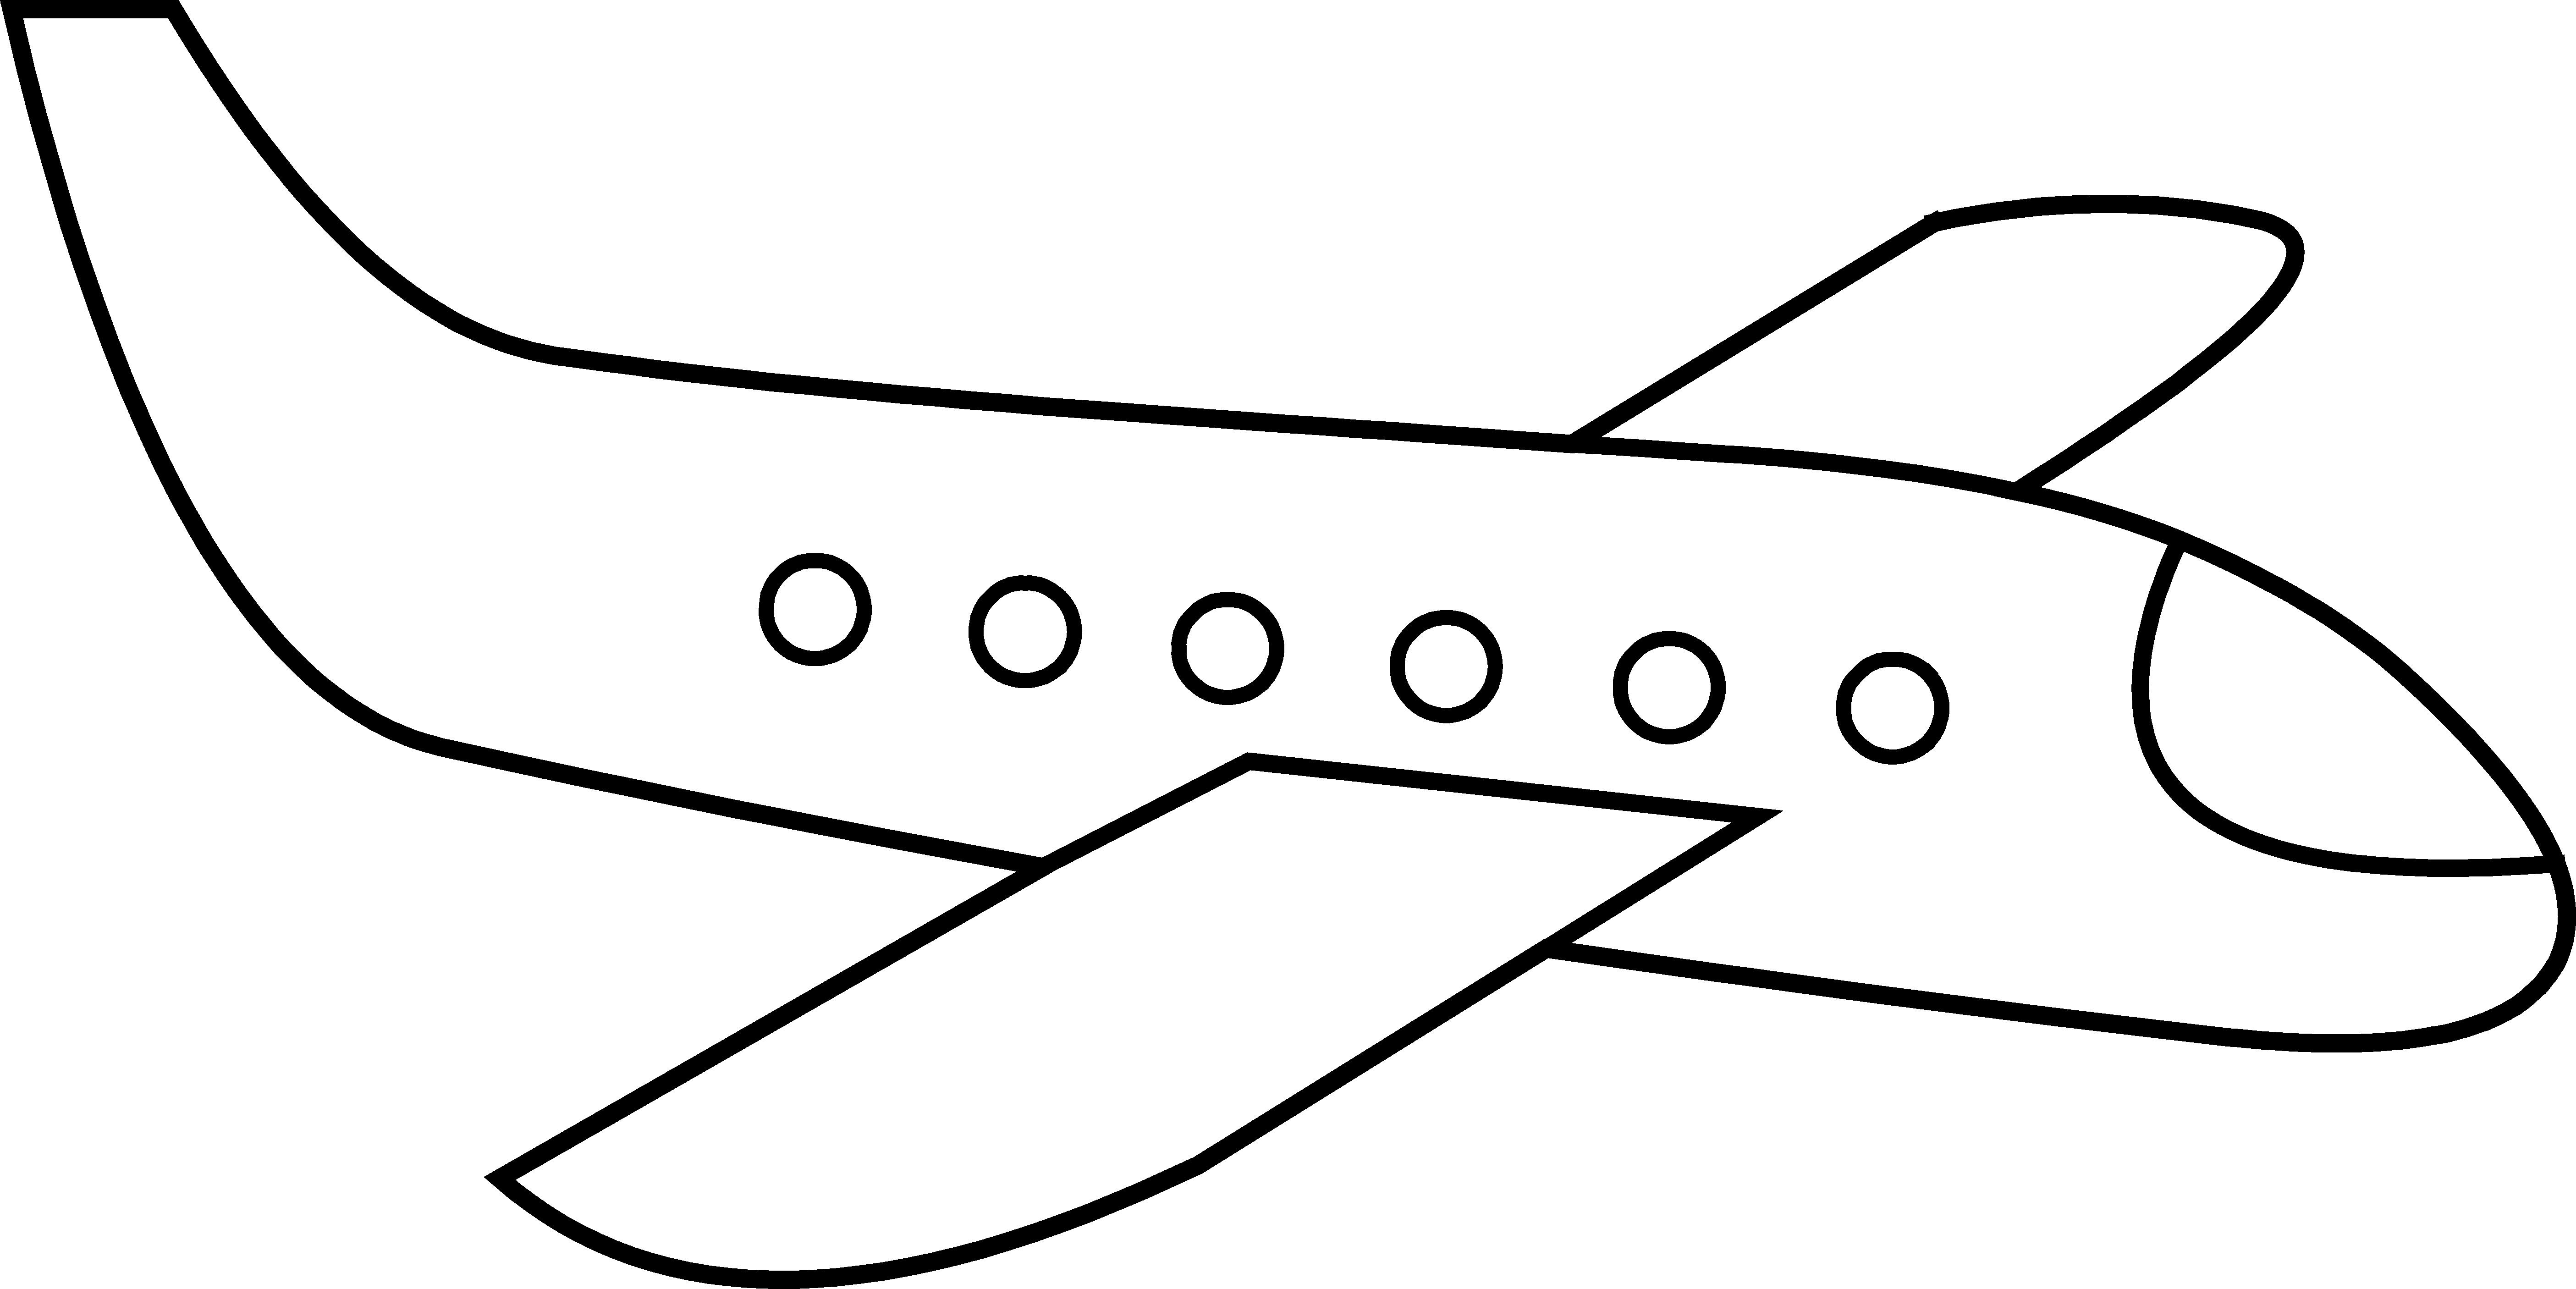 Clipart plane easy.